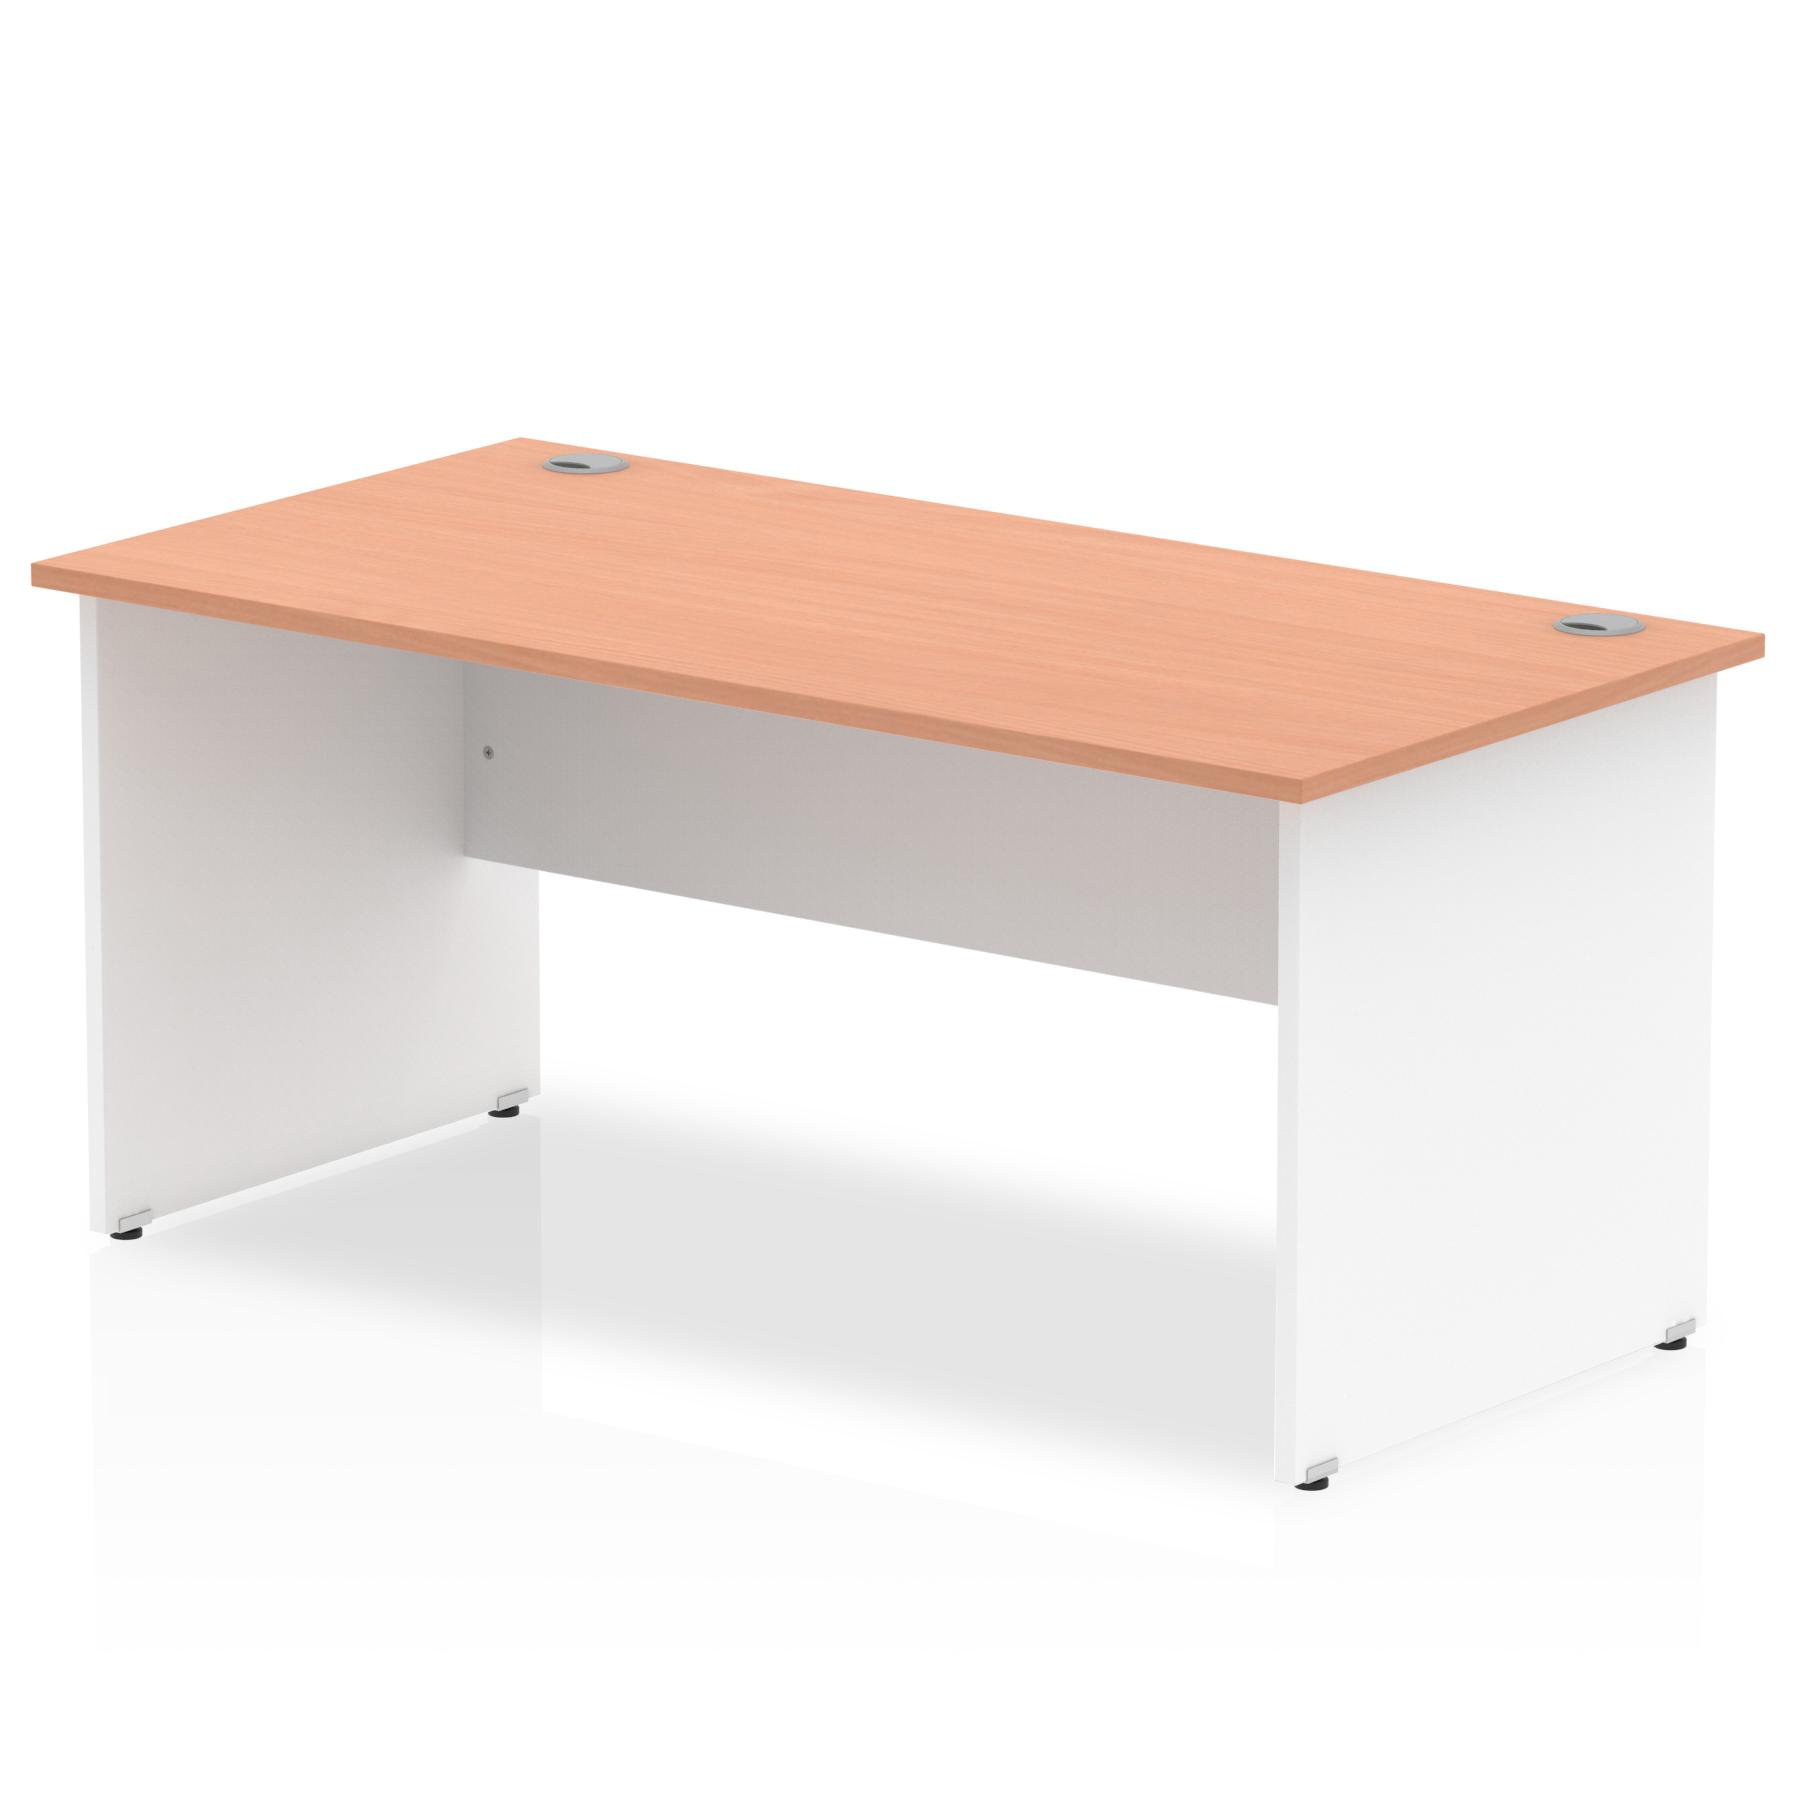 Trexus Desk Rectangle Panel End 1600x800mm Beech Top White Panels Ref TT000015